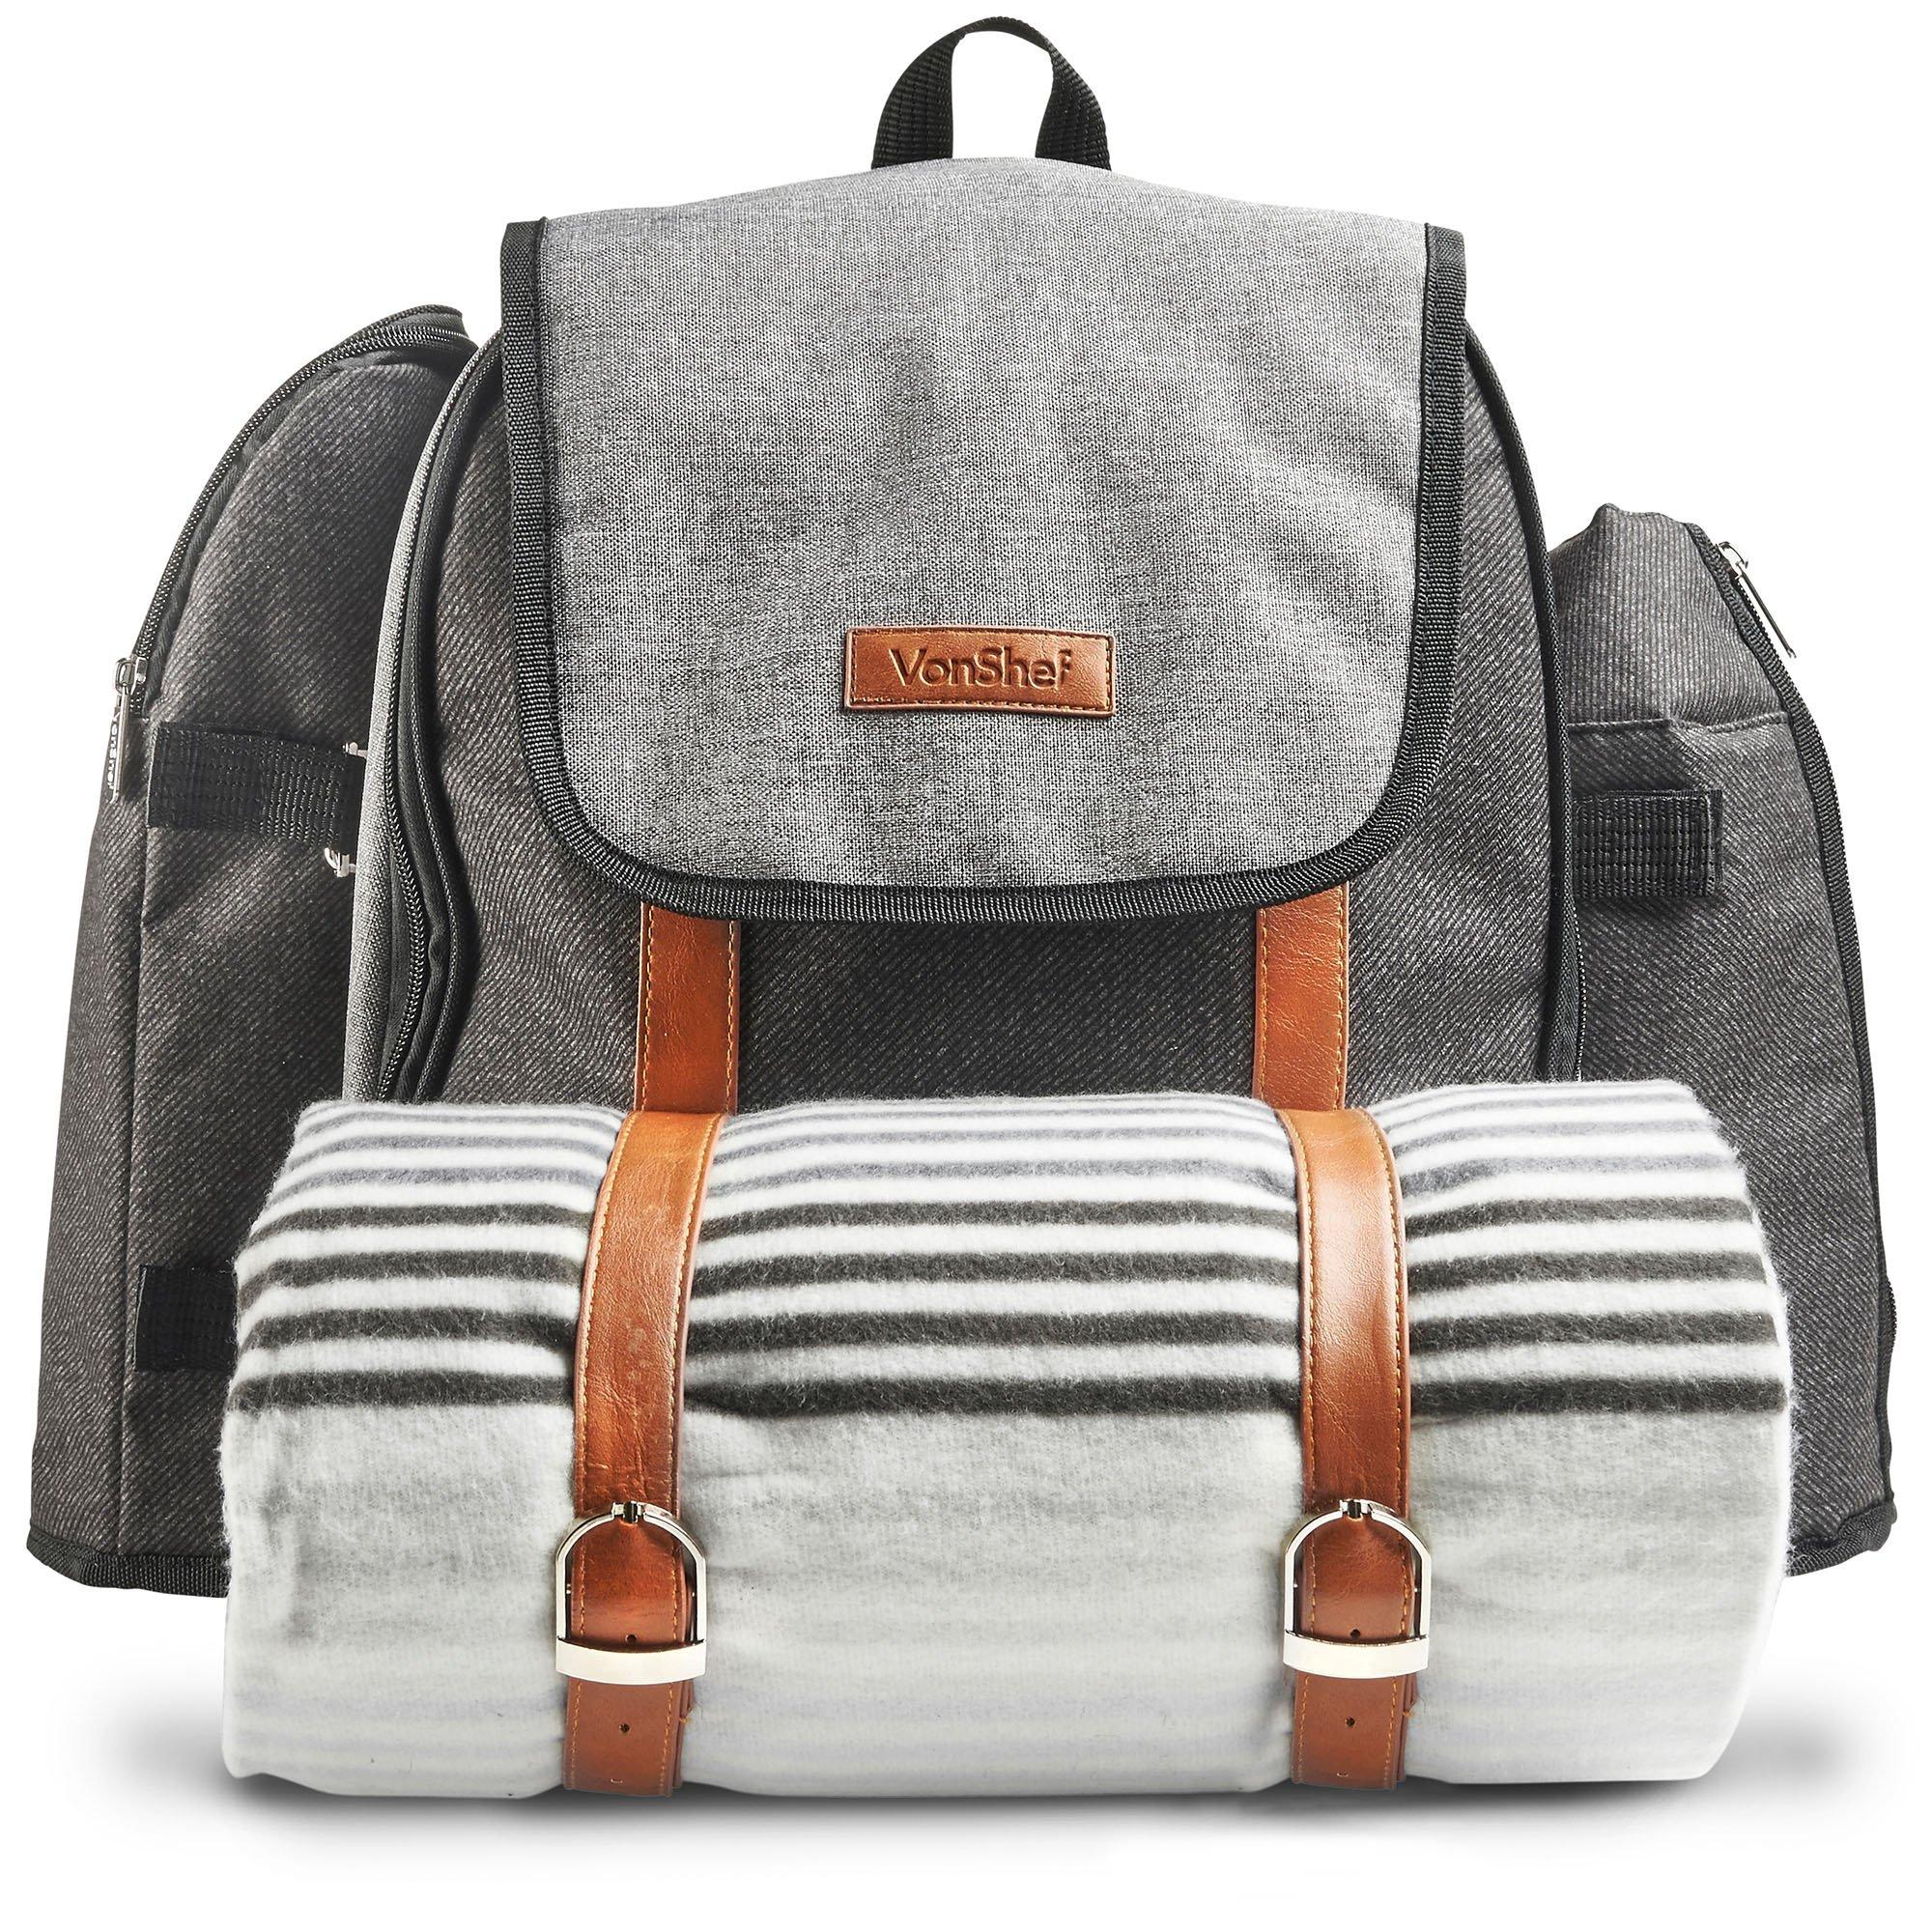 VonShef Premium Outdoor Backpack Blanket